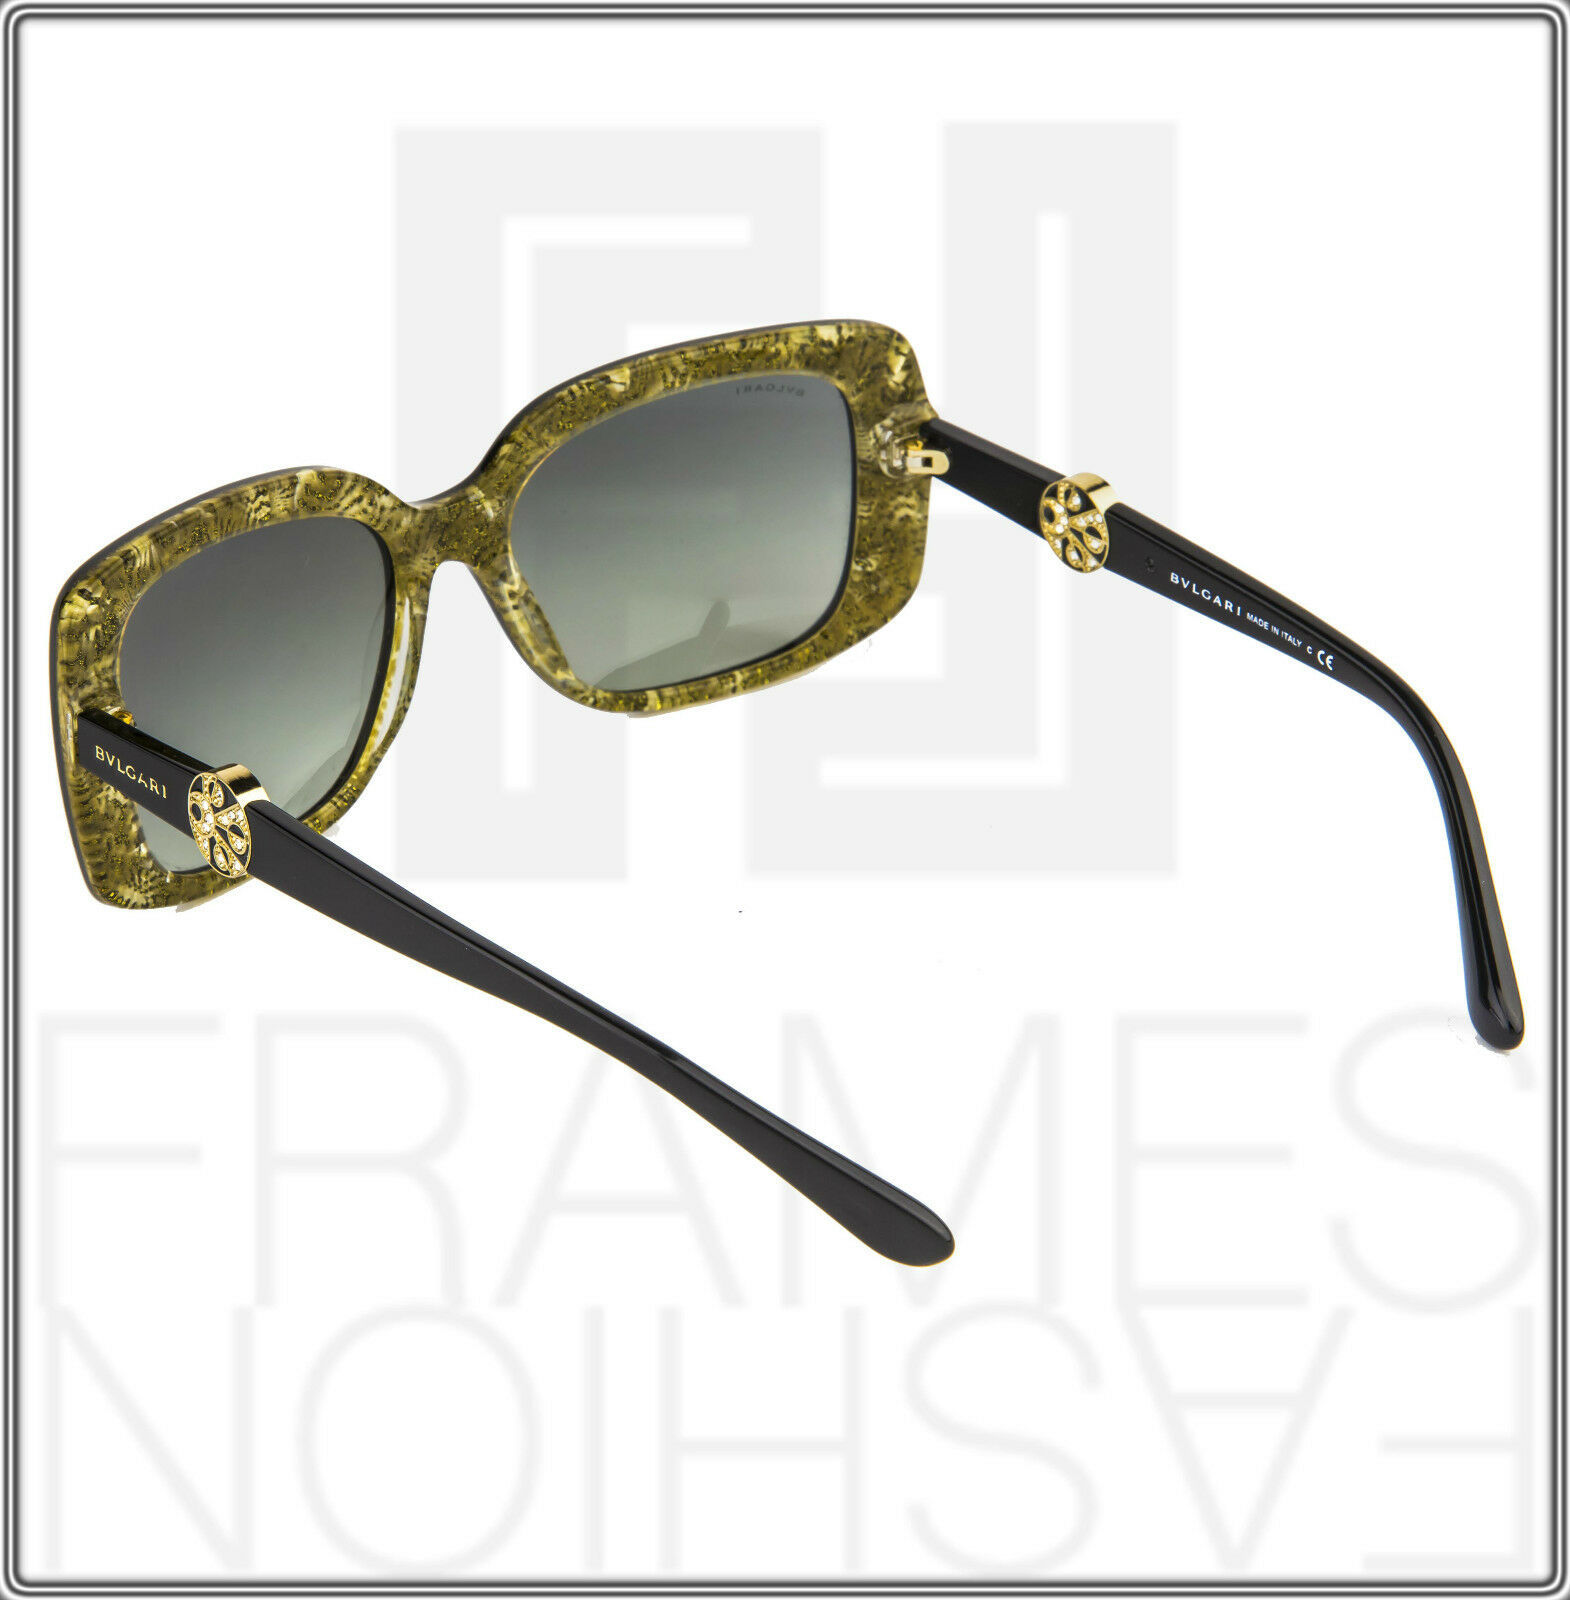 BVLGARI INTARSIO 8146B 5325/11 Black Gold Sunglasses 8146 Square Women Gradient image 4